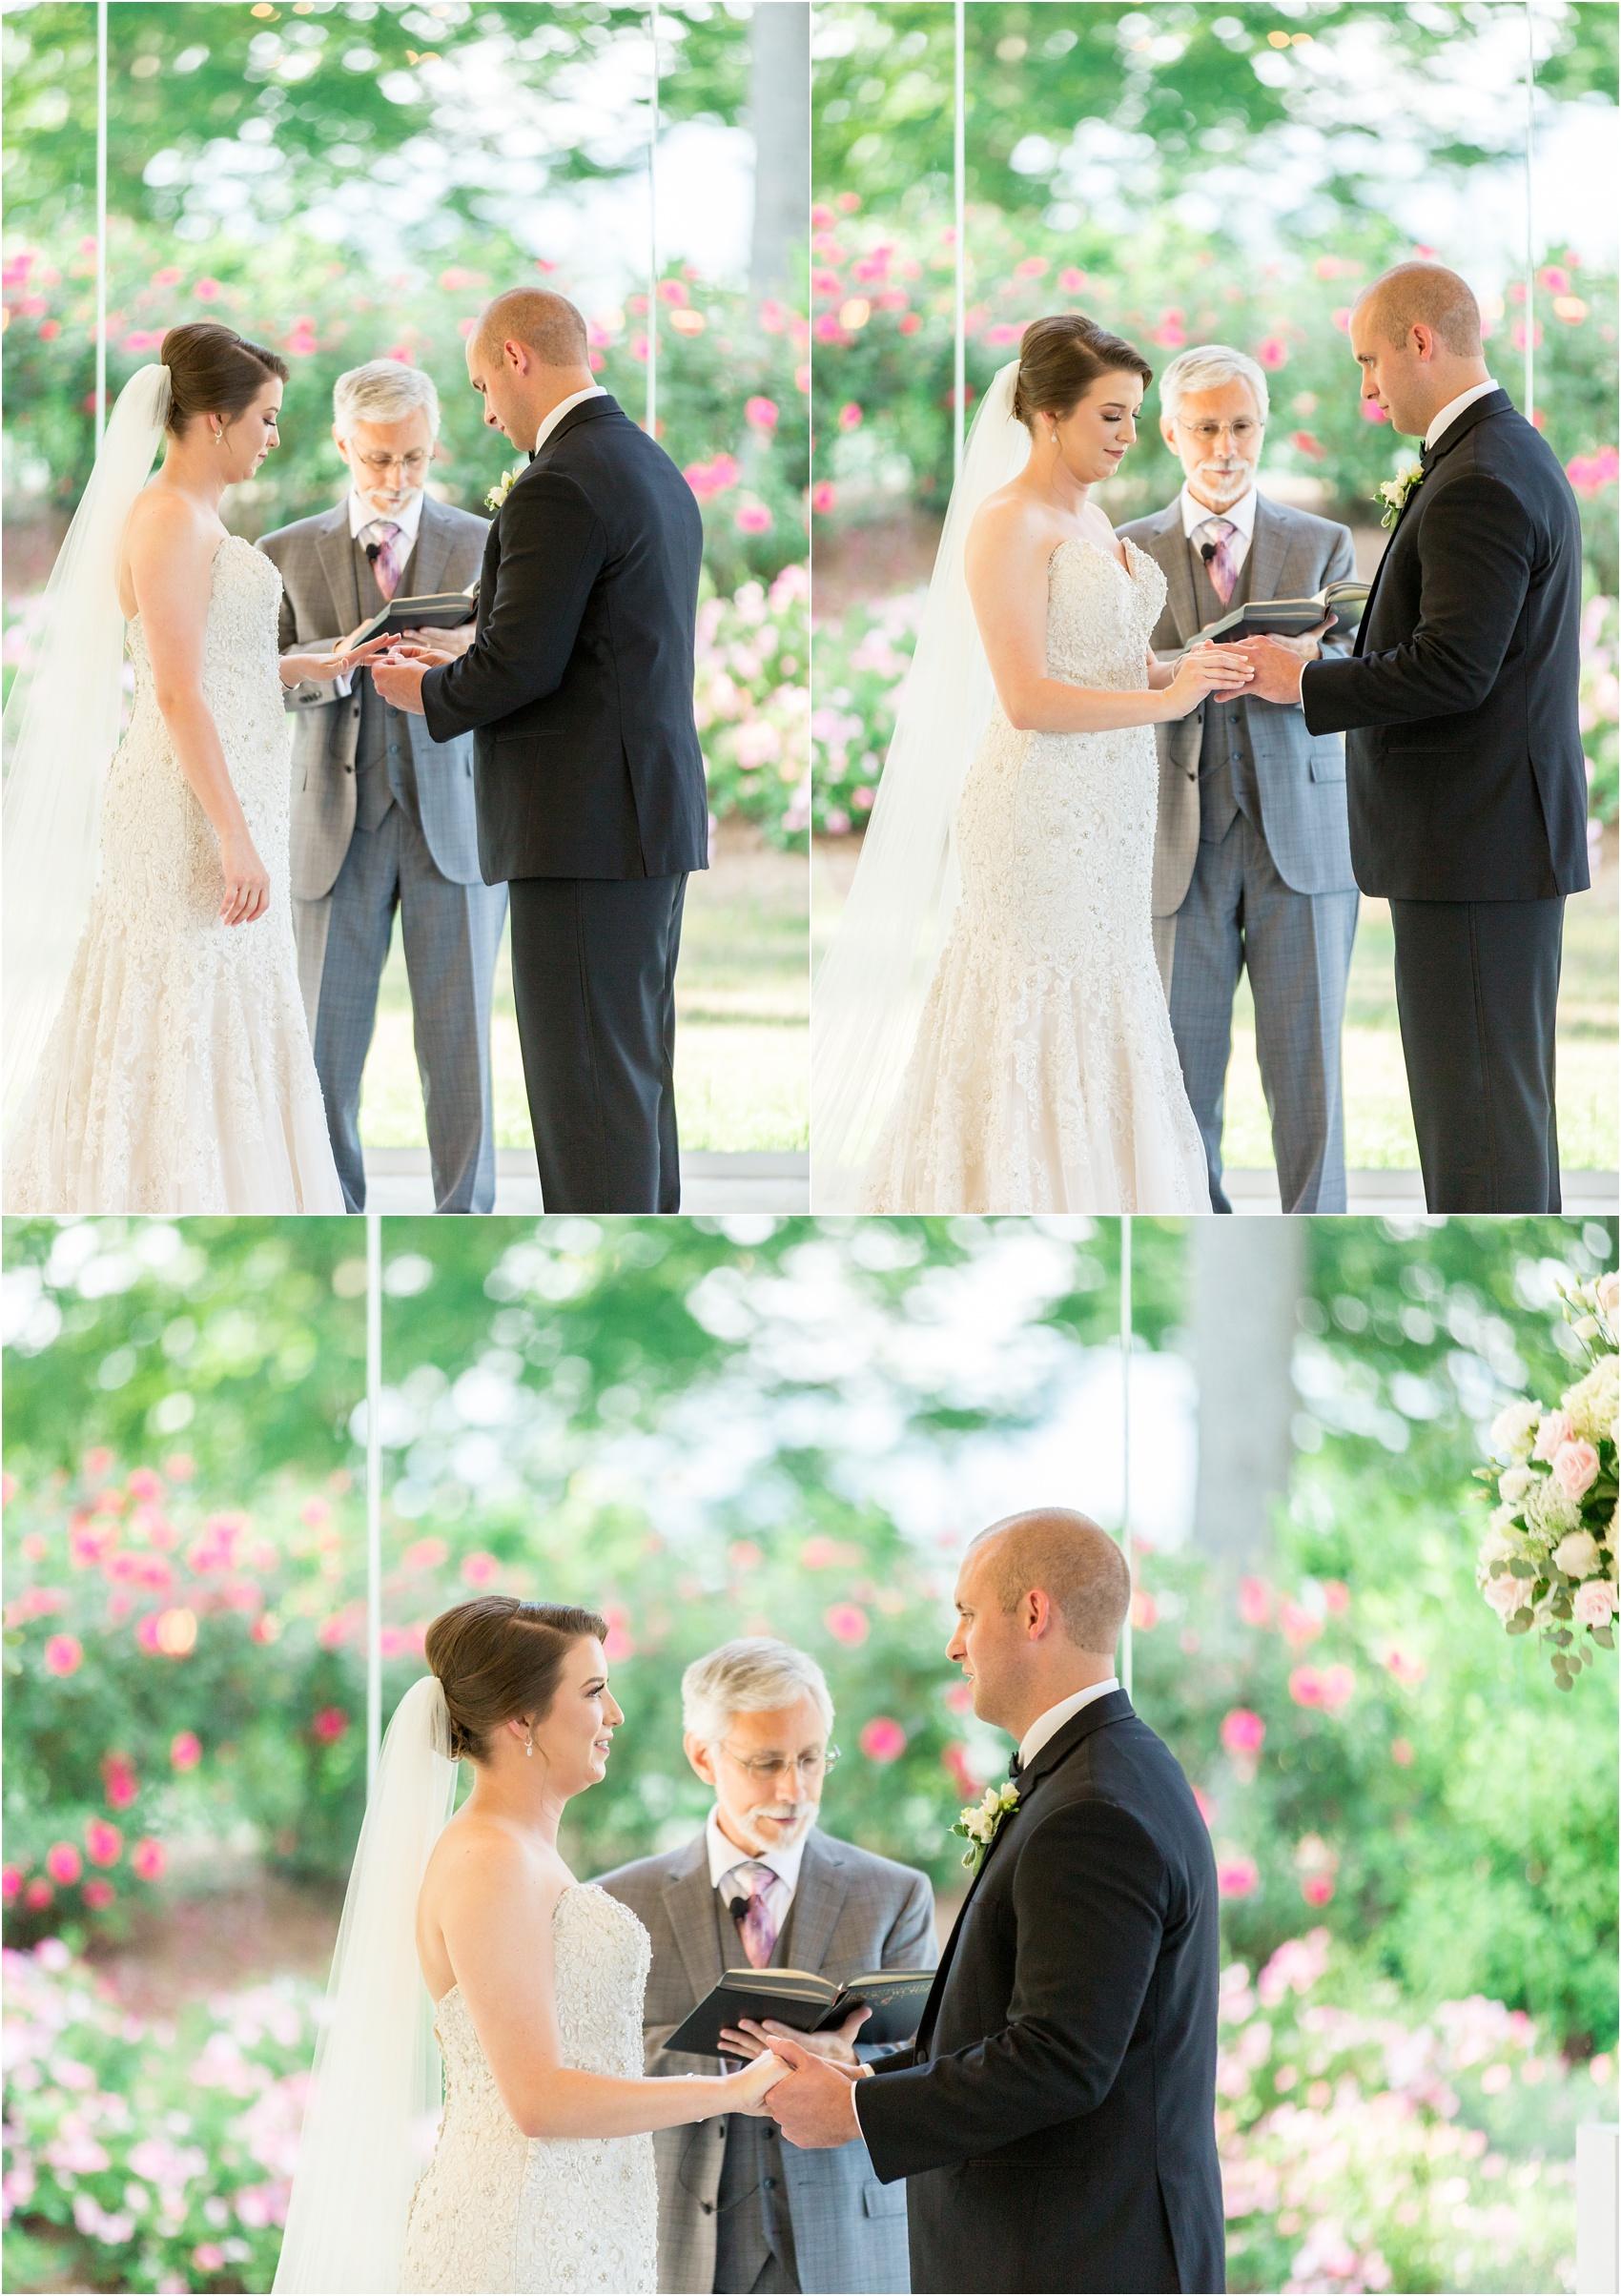 Savannah Eve Photography- Nutt Wedding- Blog-79.jpg